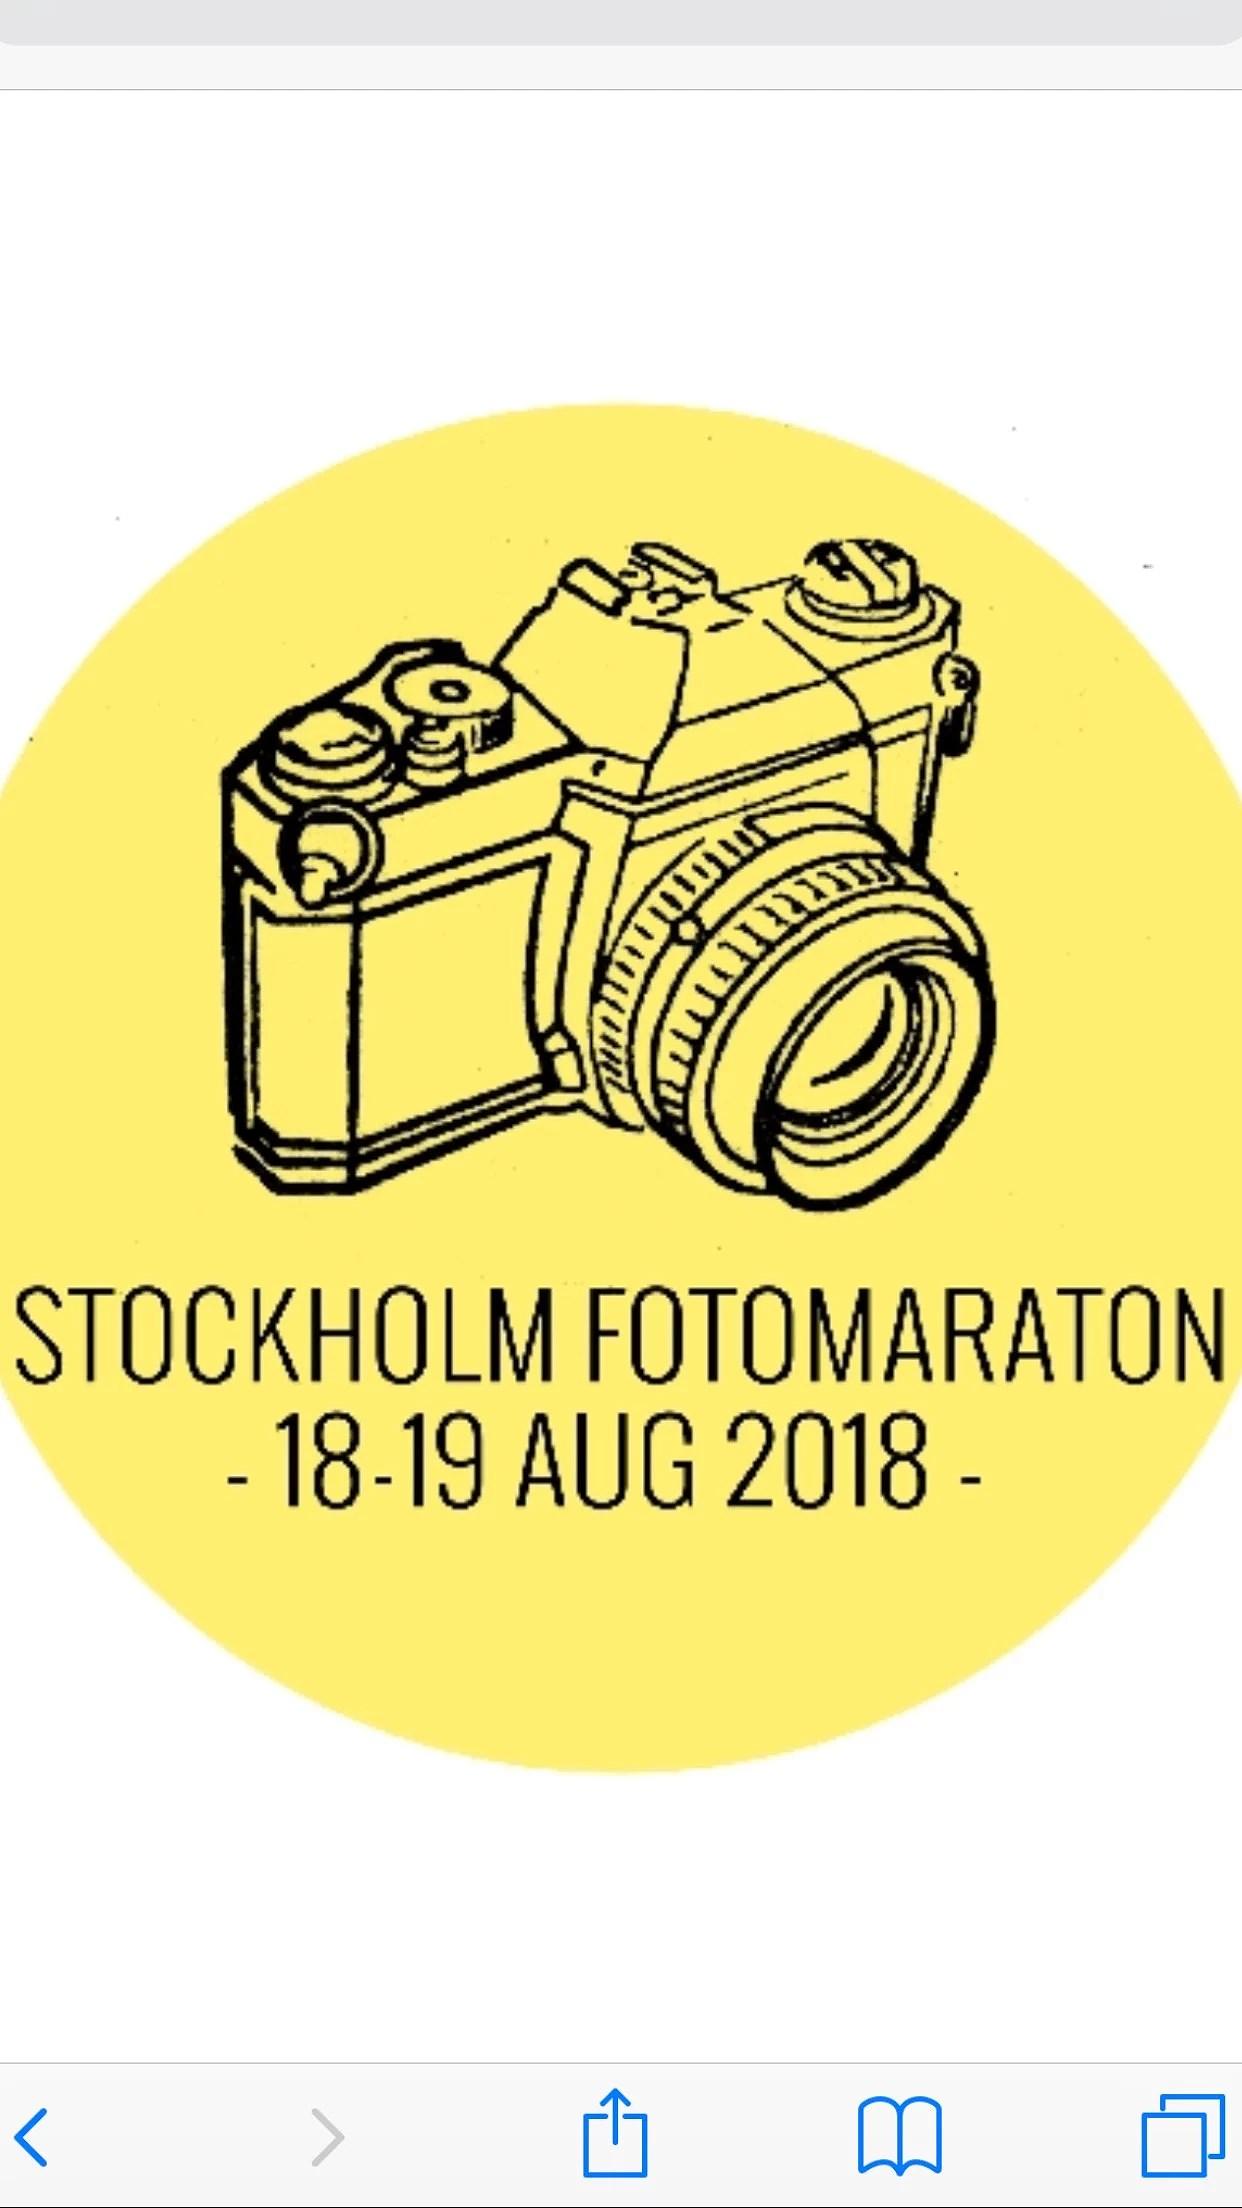 Stockholm Fotomaraton.